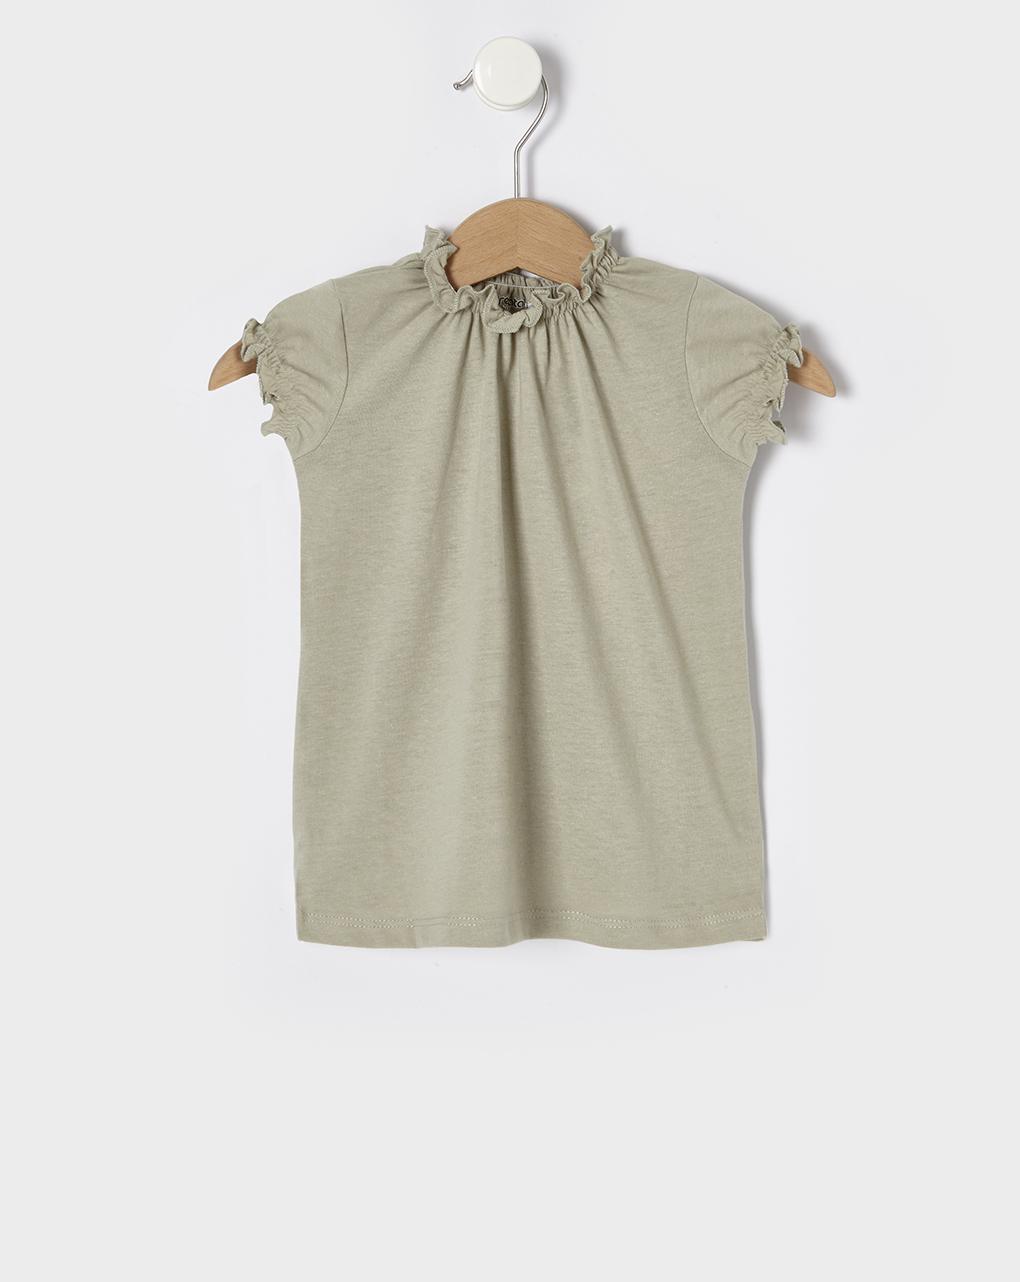 T-Shirt Basic Ανοιχτό Πράσινο για Κορίτσι